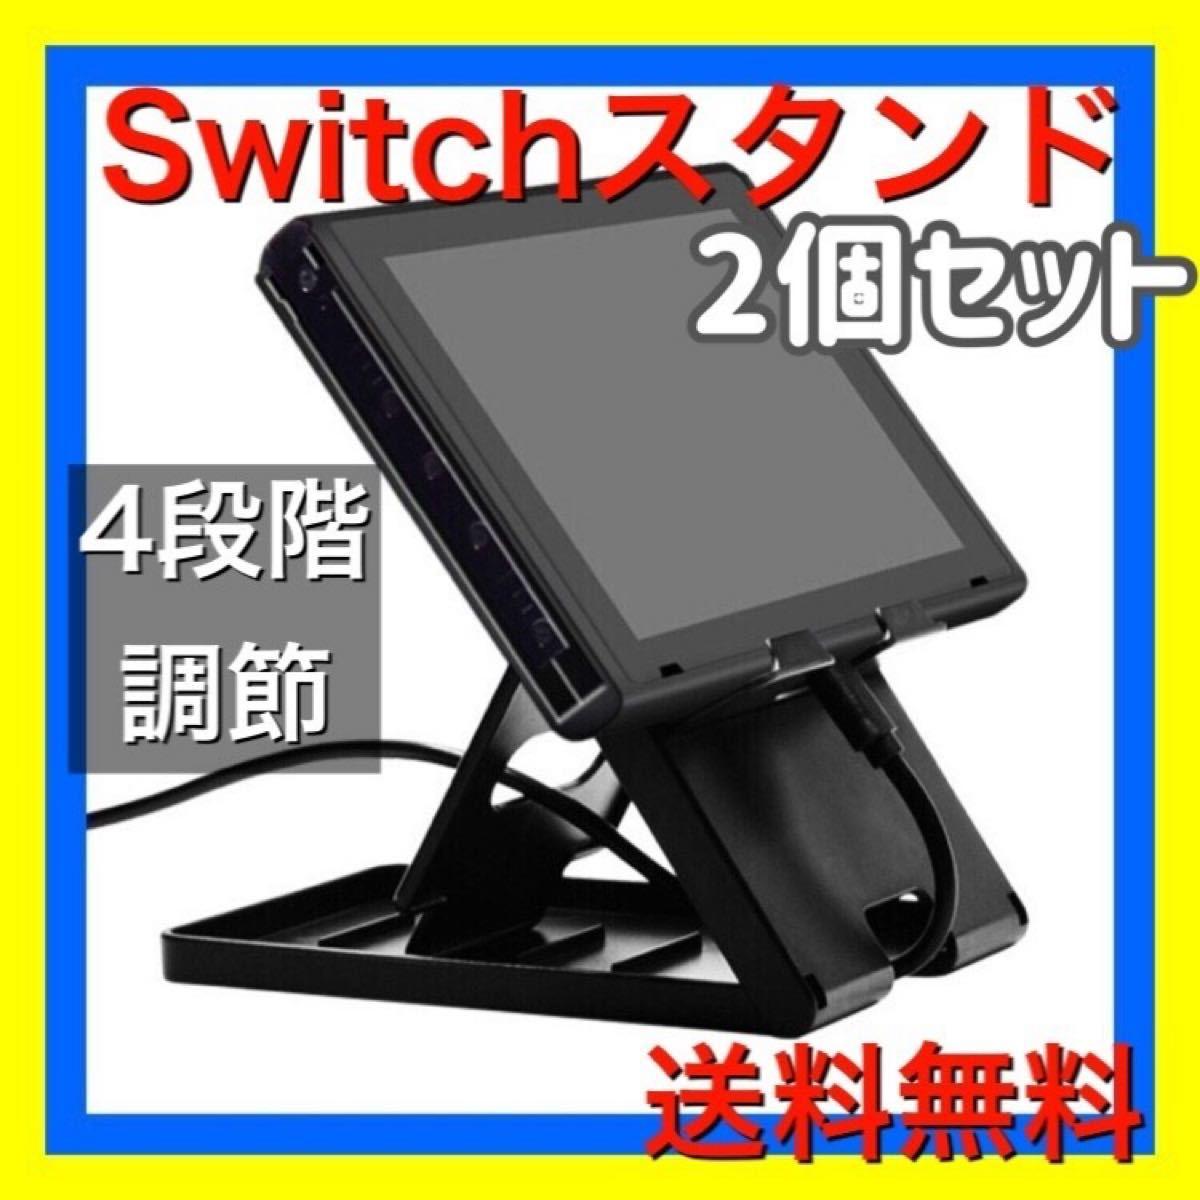 Switch ポータブルスタンド【2個セット】4段階調節 任天堂スイッチ